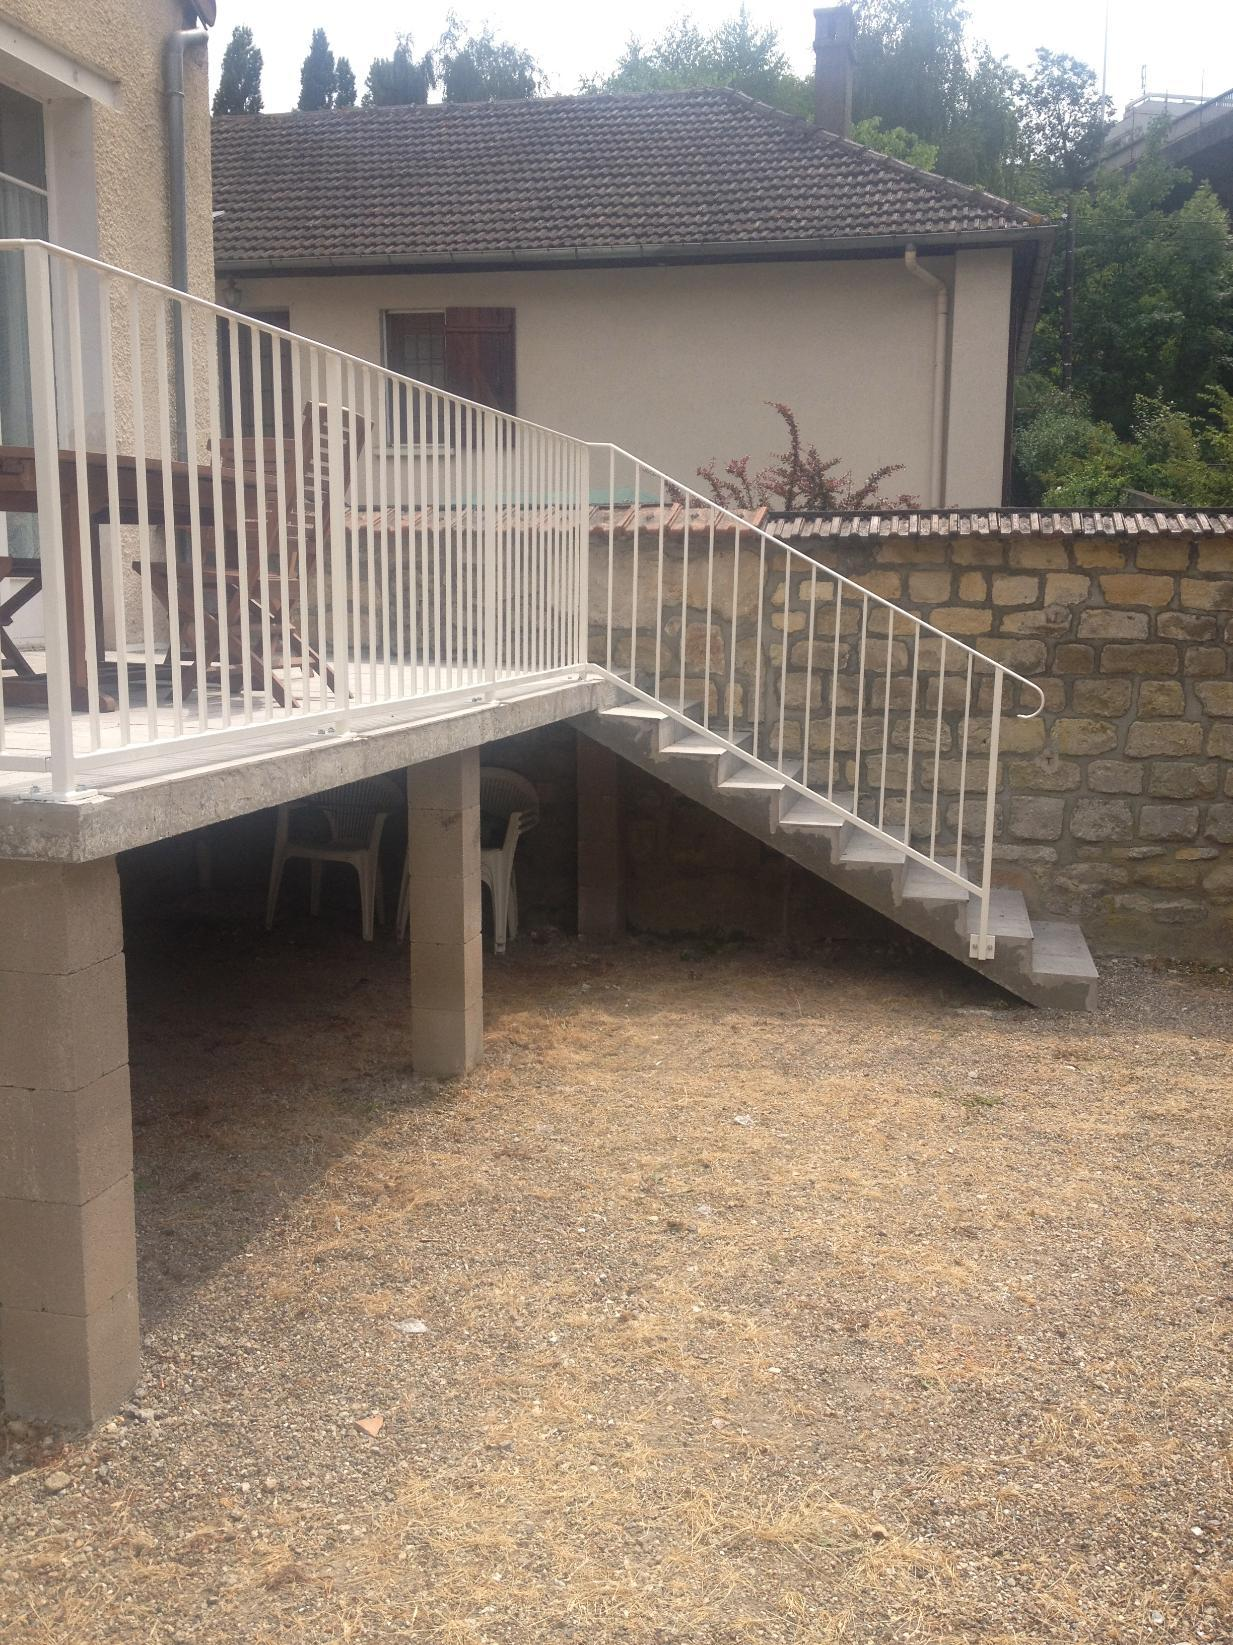 Escalier Val D Oise travaux de métallerie-ferronnerie et serrurerie à herblay